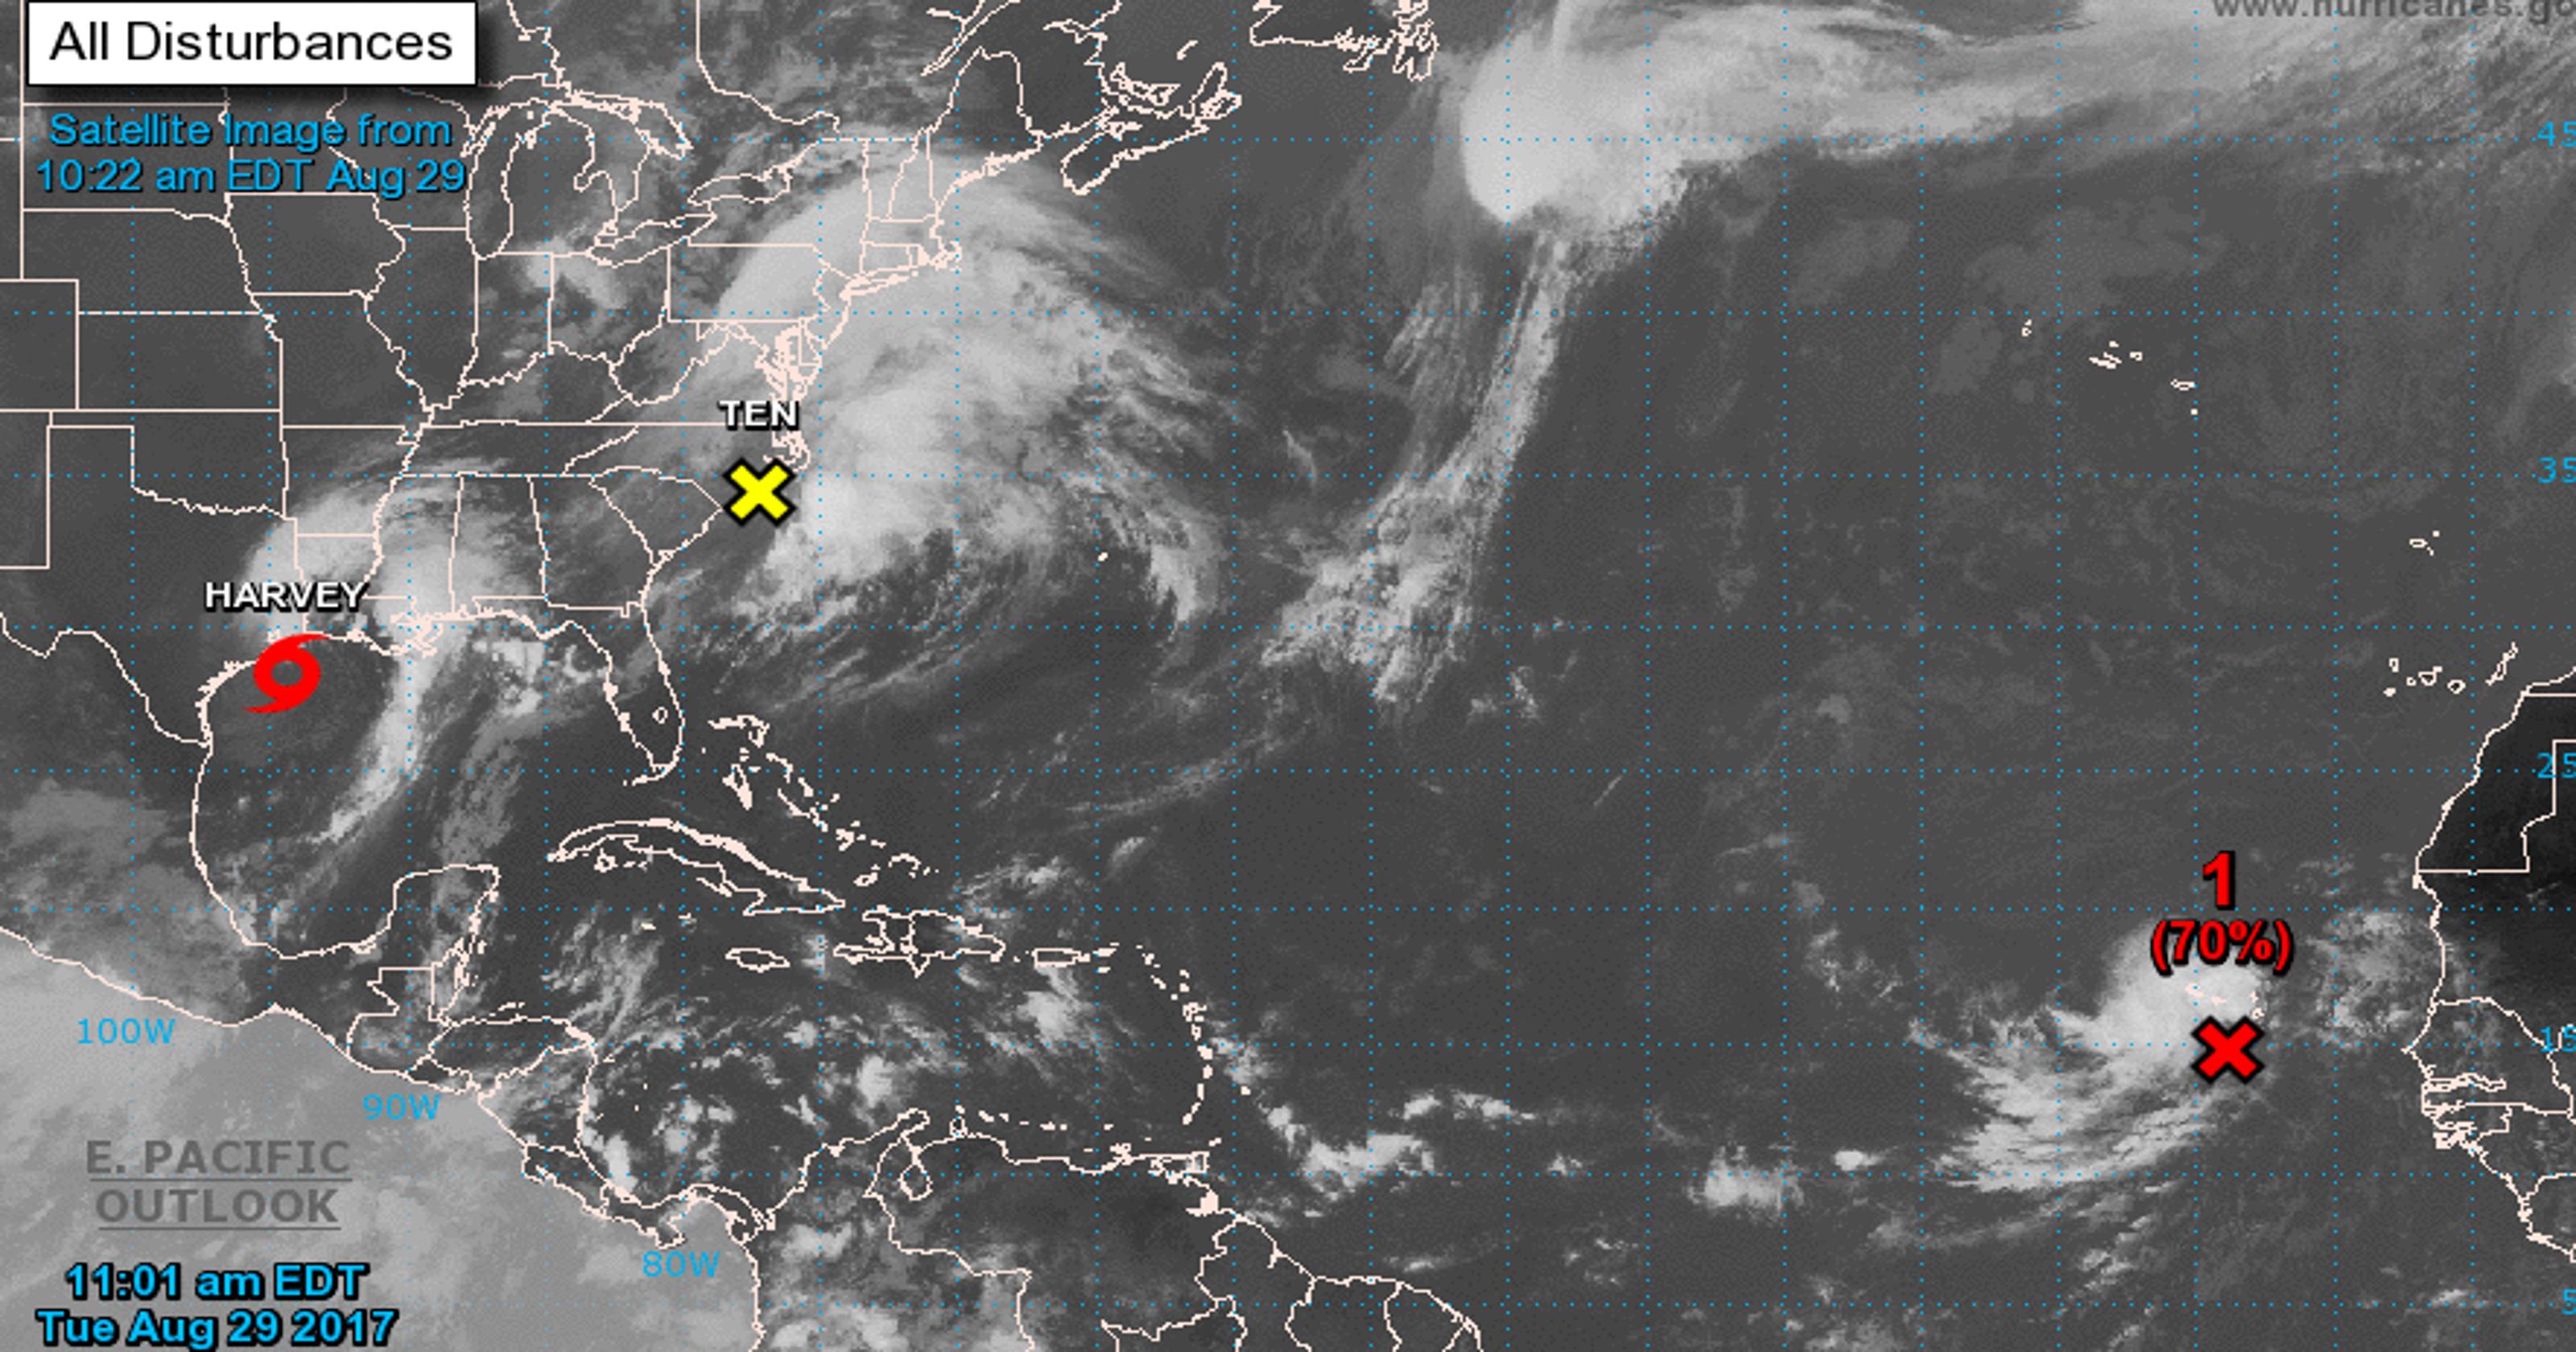 Tropical disturbance 1 escalates, escalates, 1 now it's Tropical Storm Irma e30a13